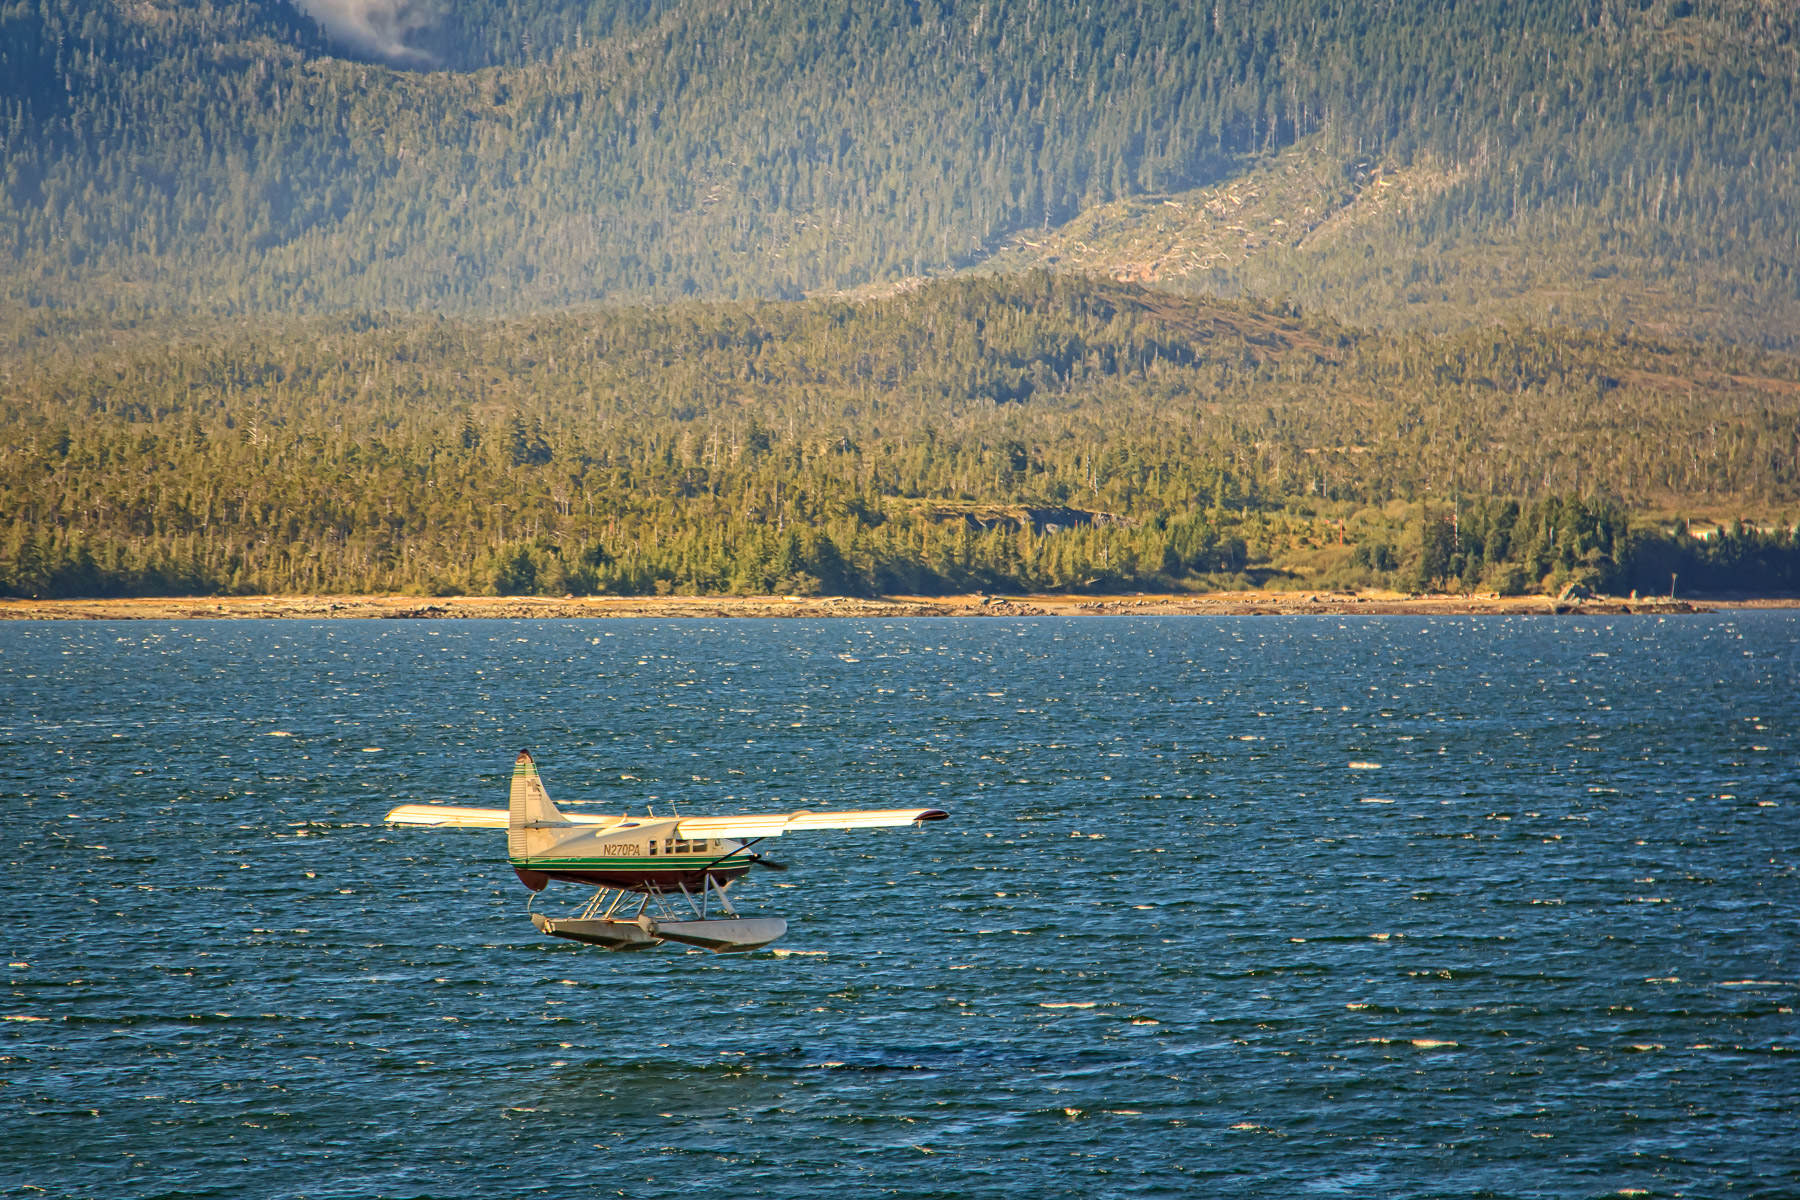 A floatplane lands in the Tongass Narrows in Ketchikan, Alaska.